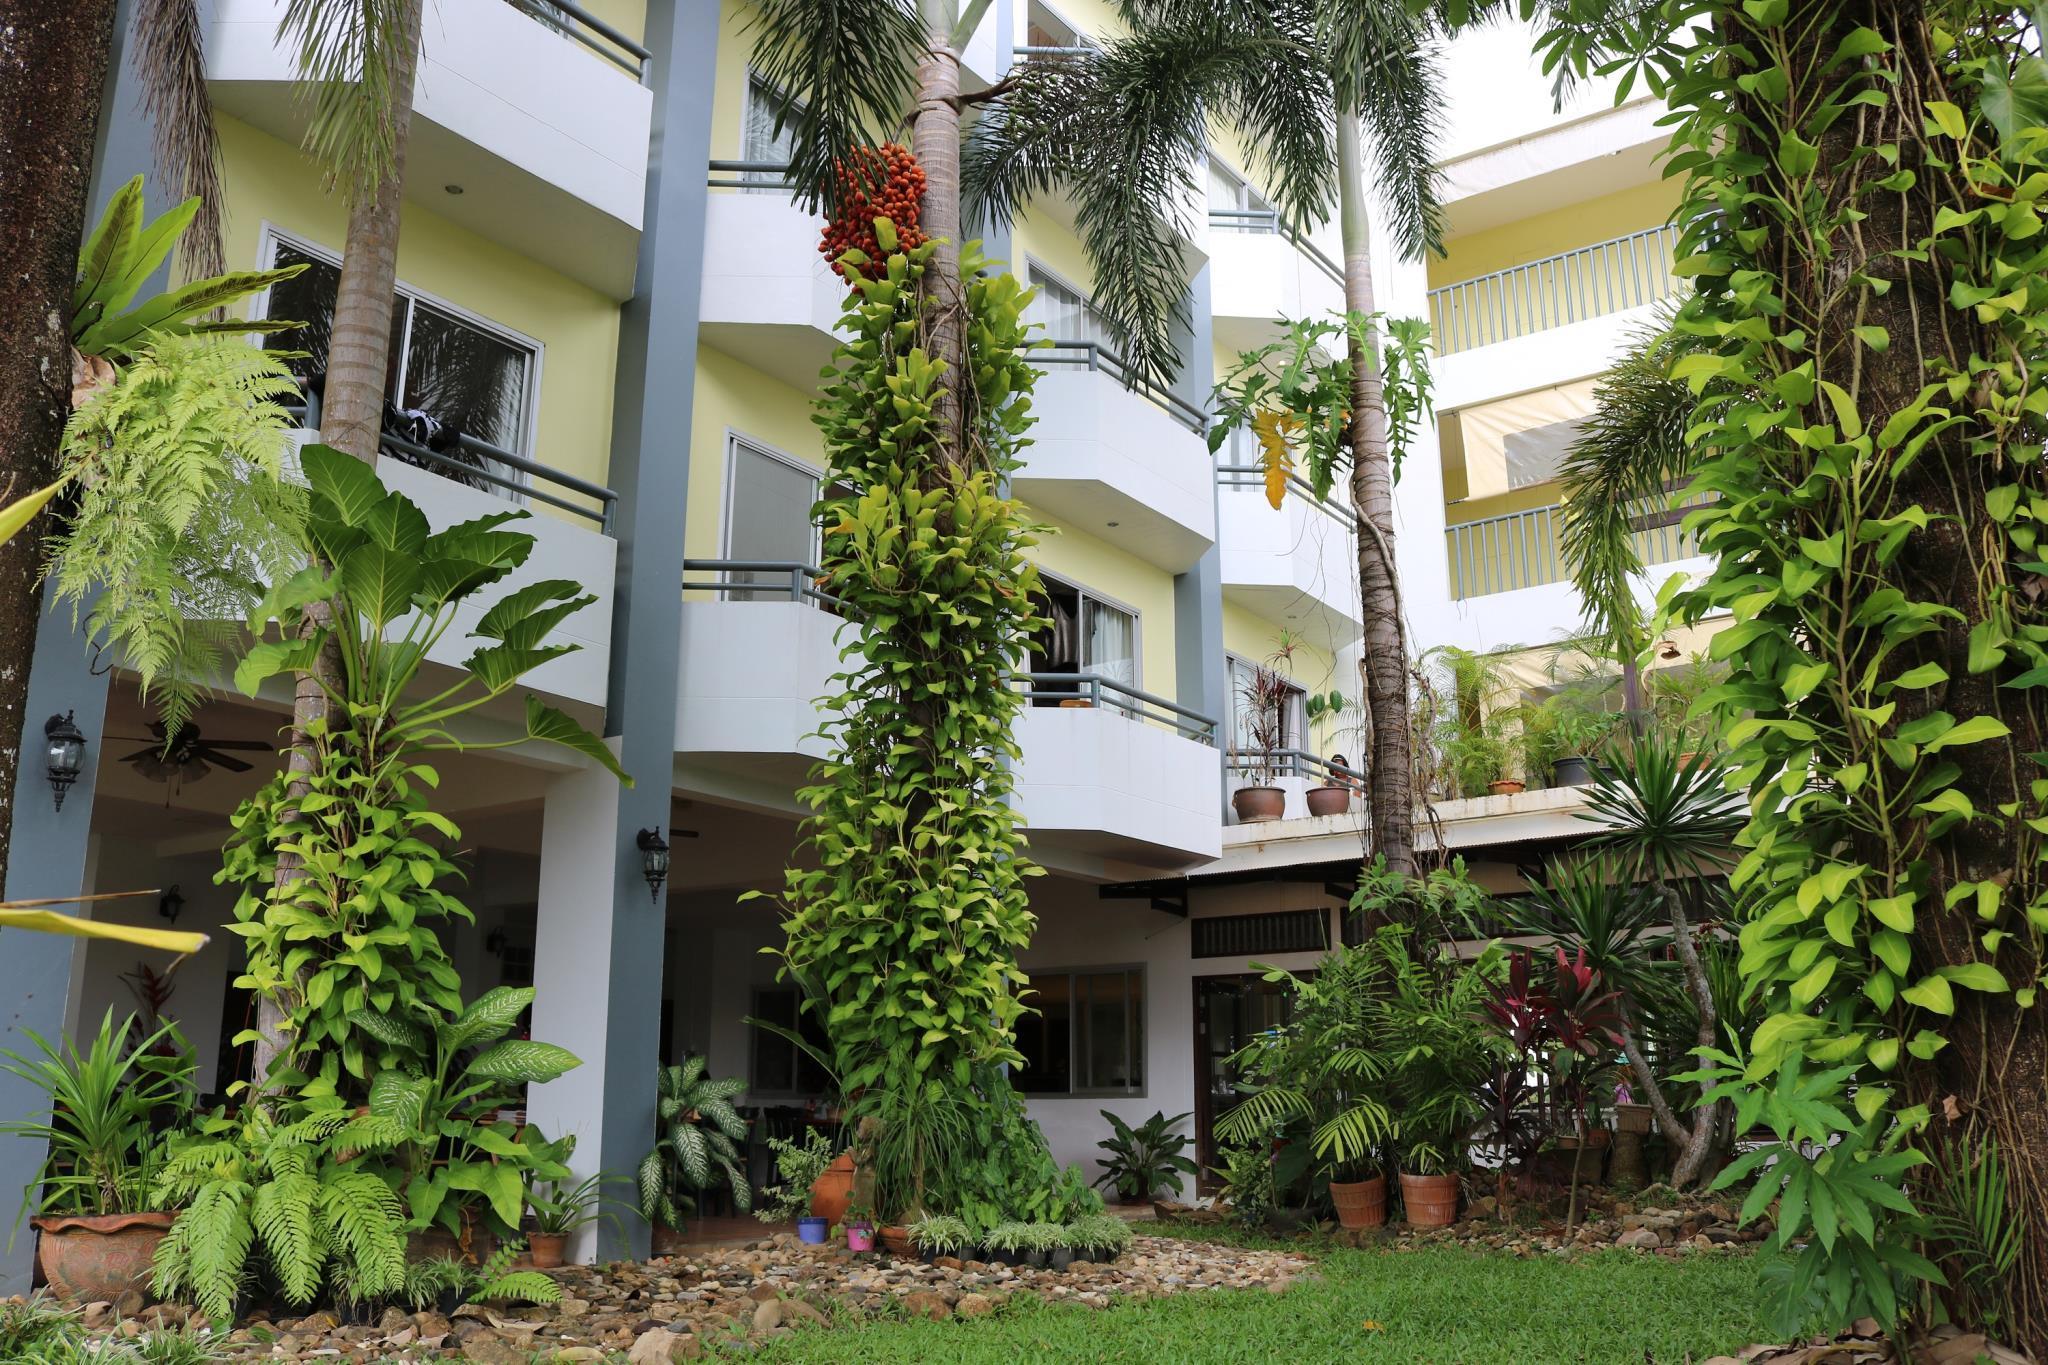 The Greenery Hotel